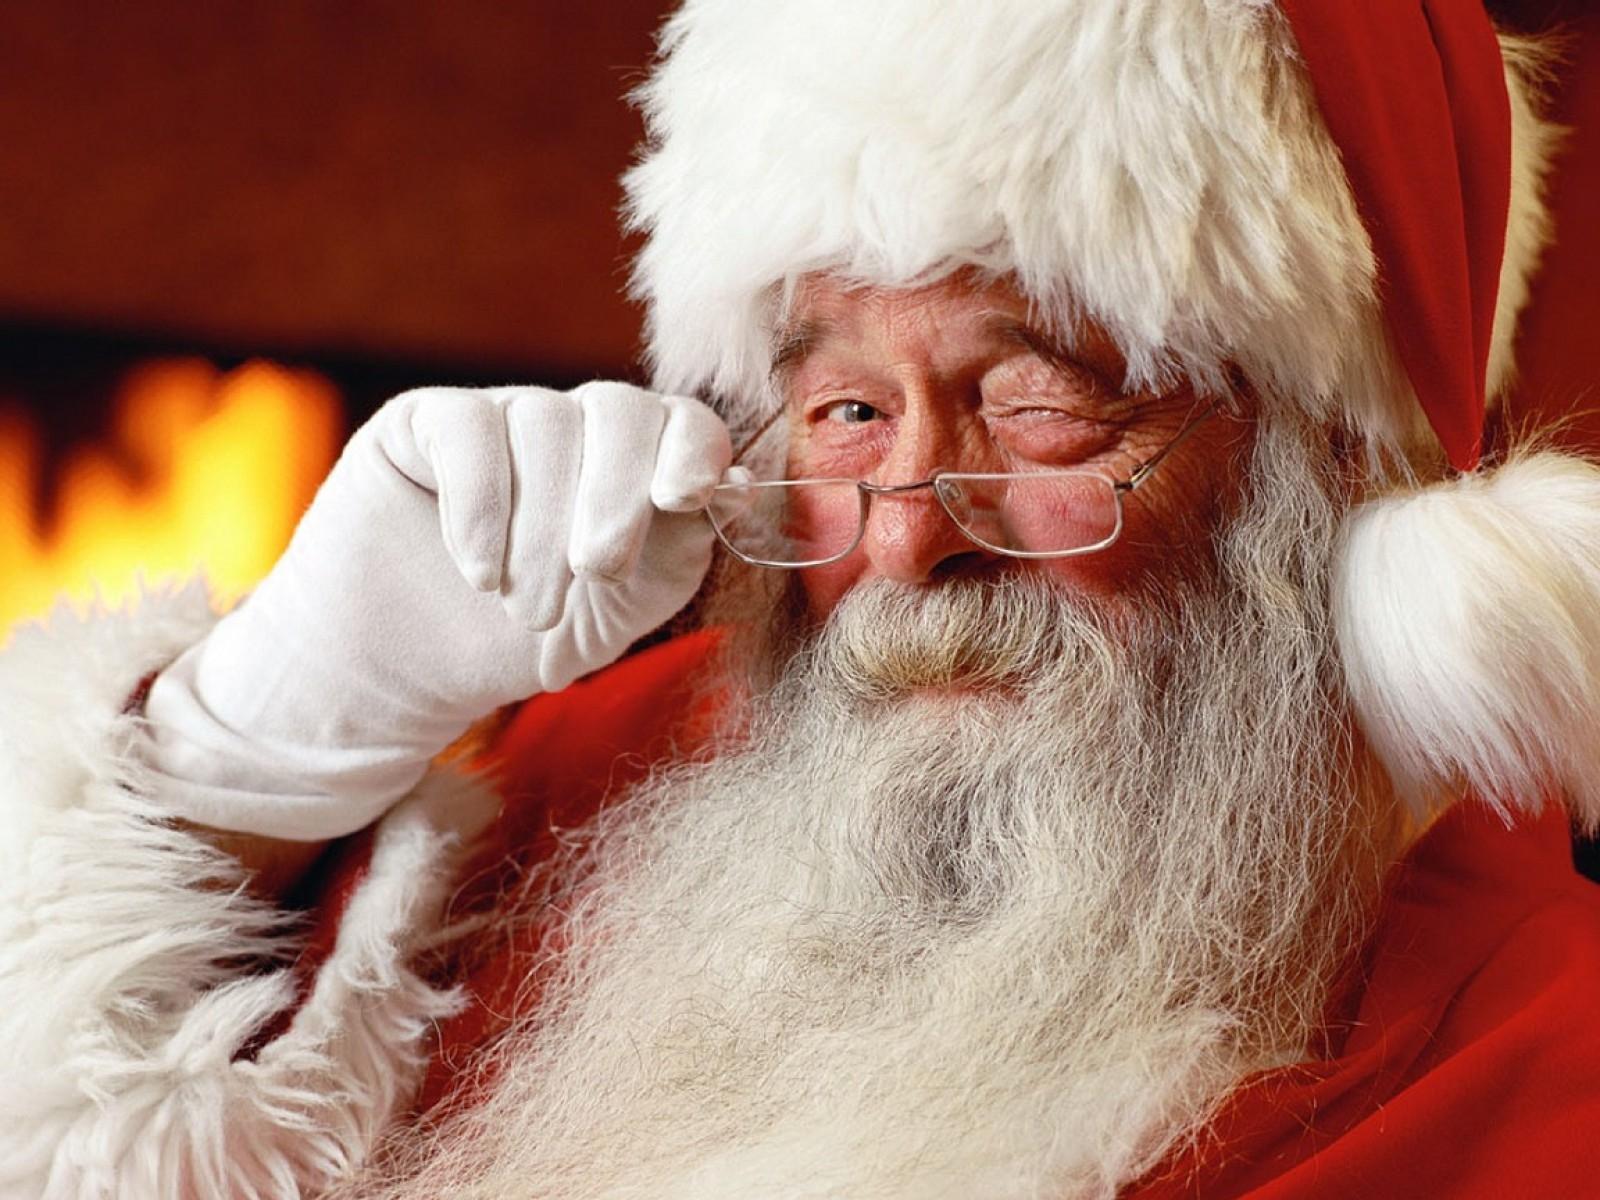 NOW it's the Christmas Season!